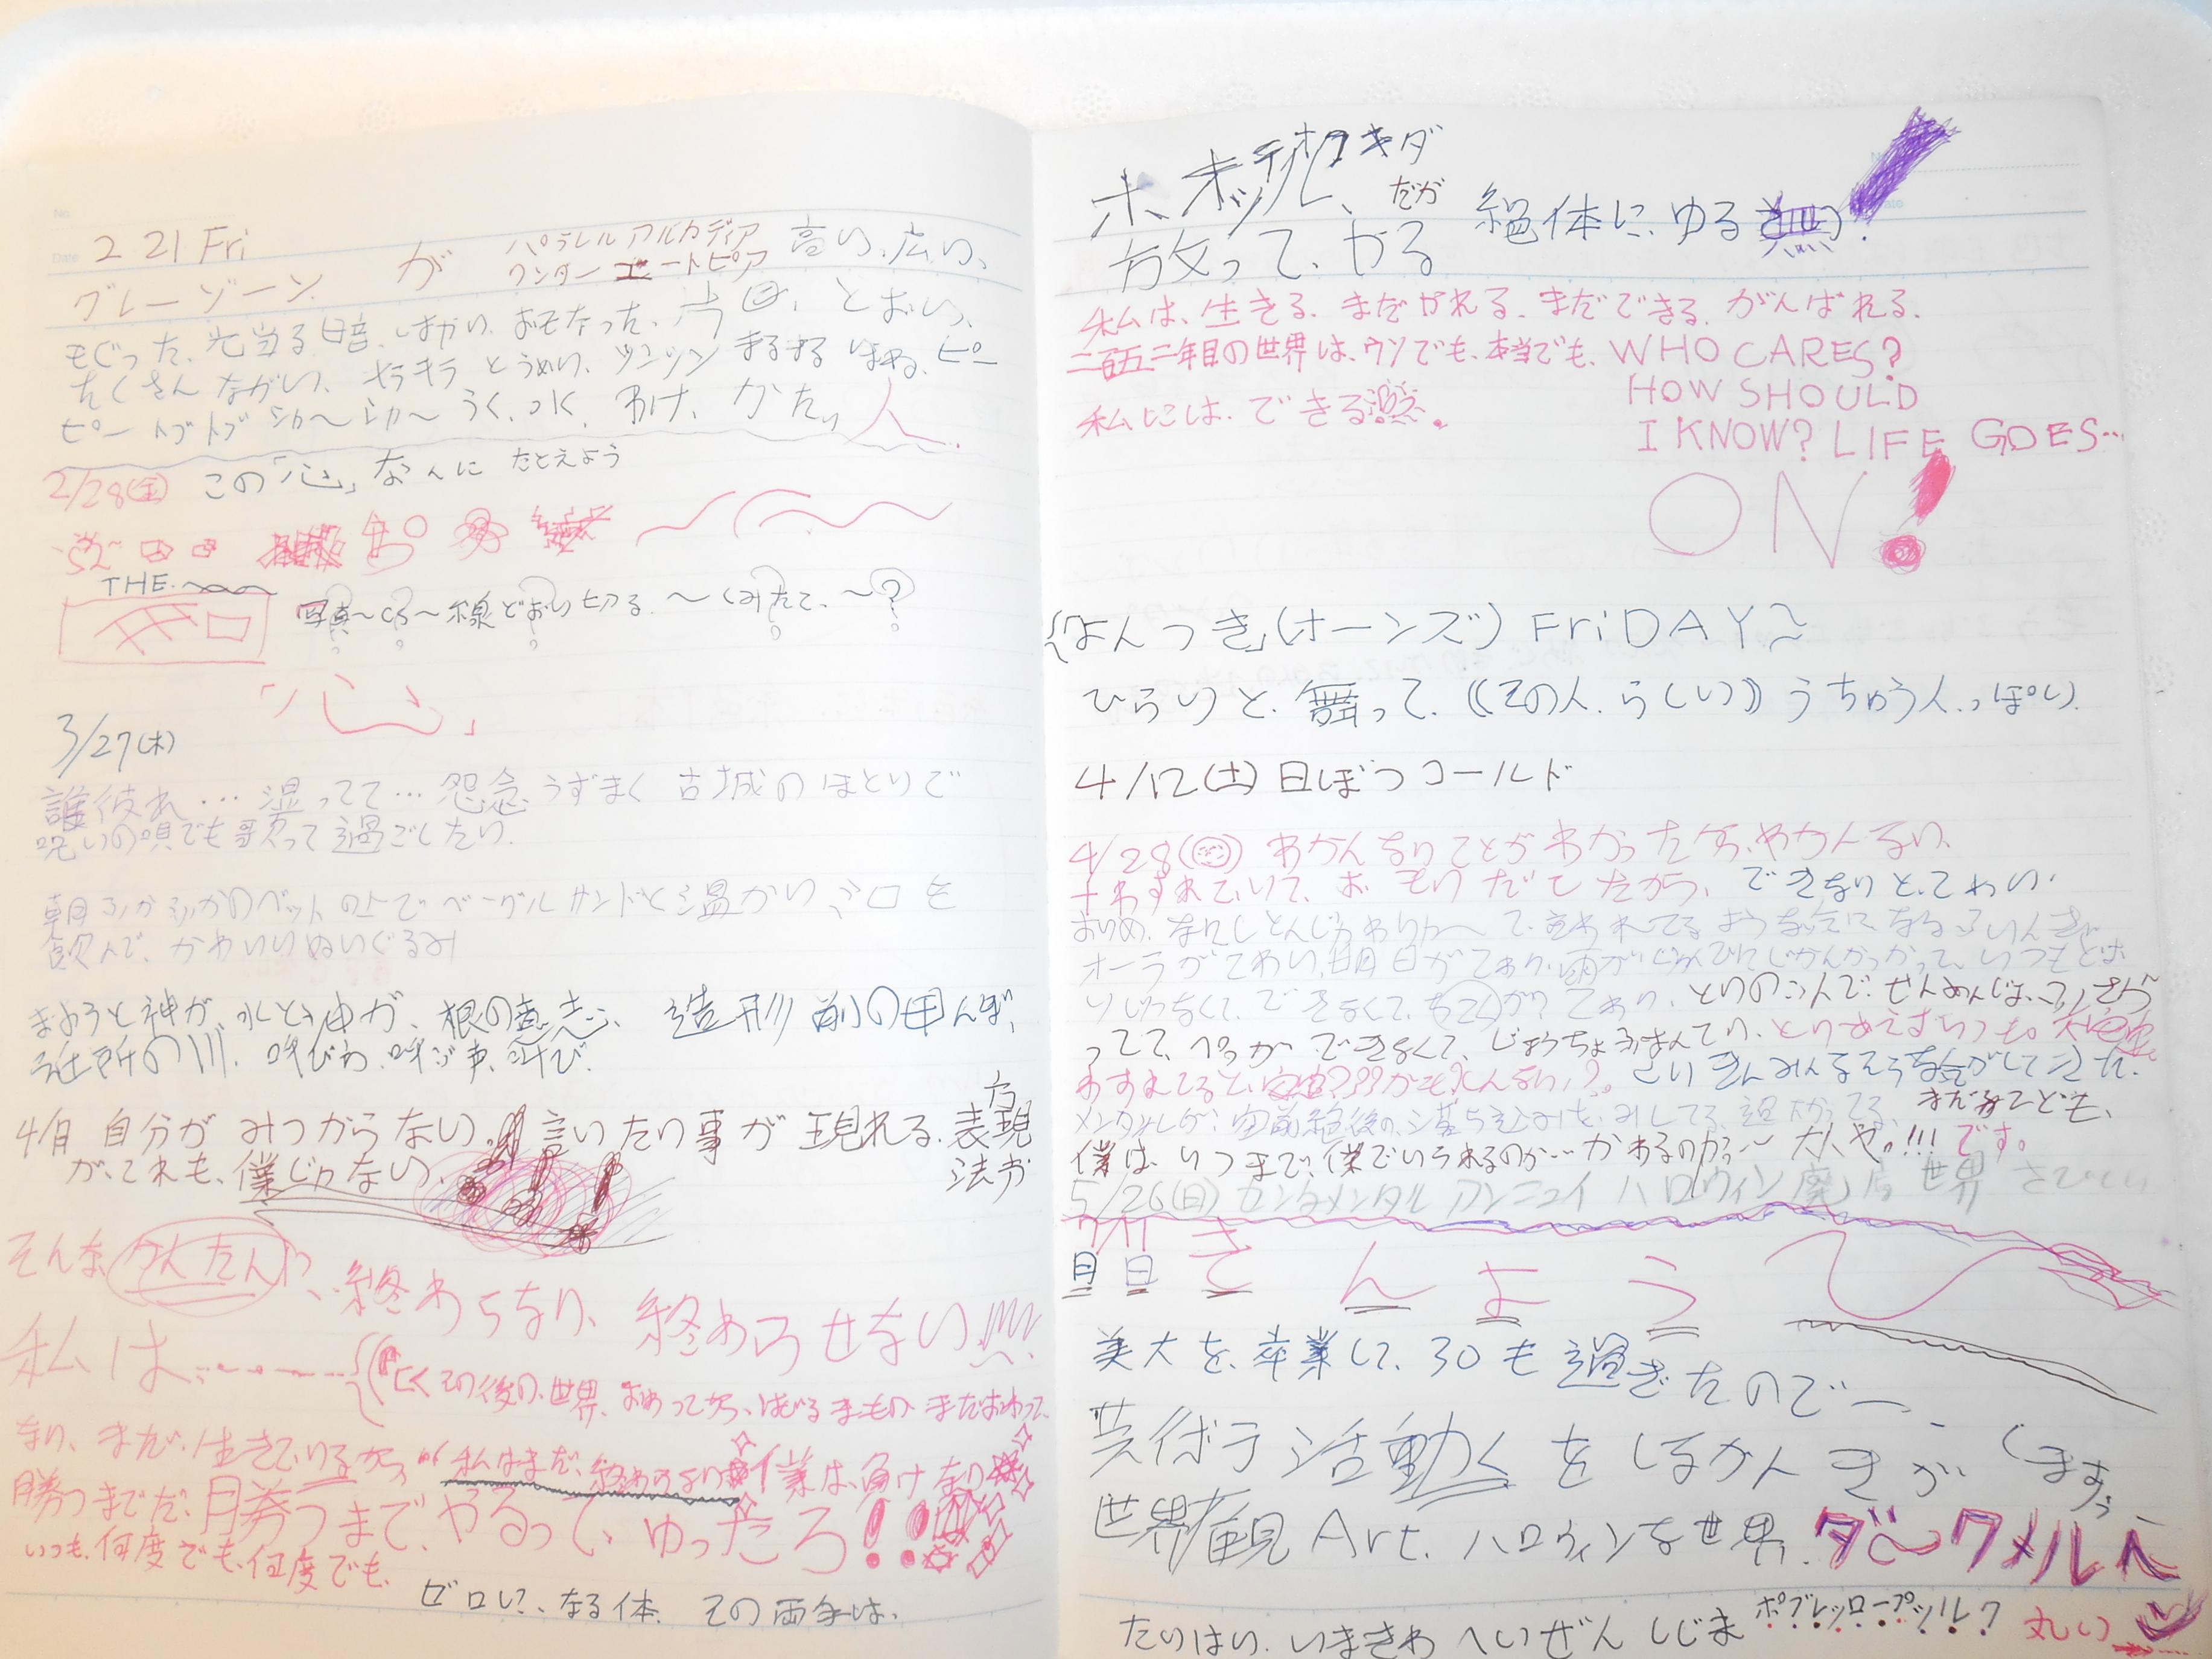 f:id:Df-kyounoyume-Sneonstiamlegnita:20170609182157j:plain